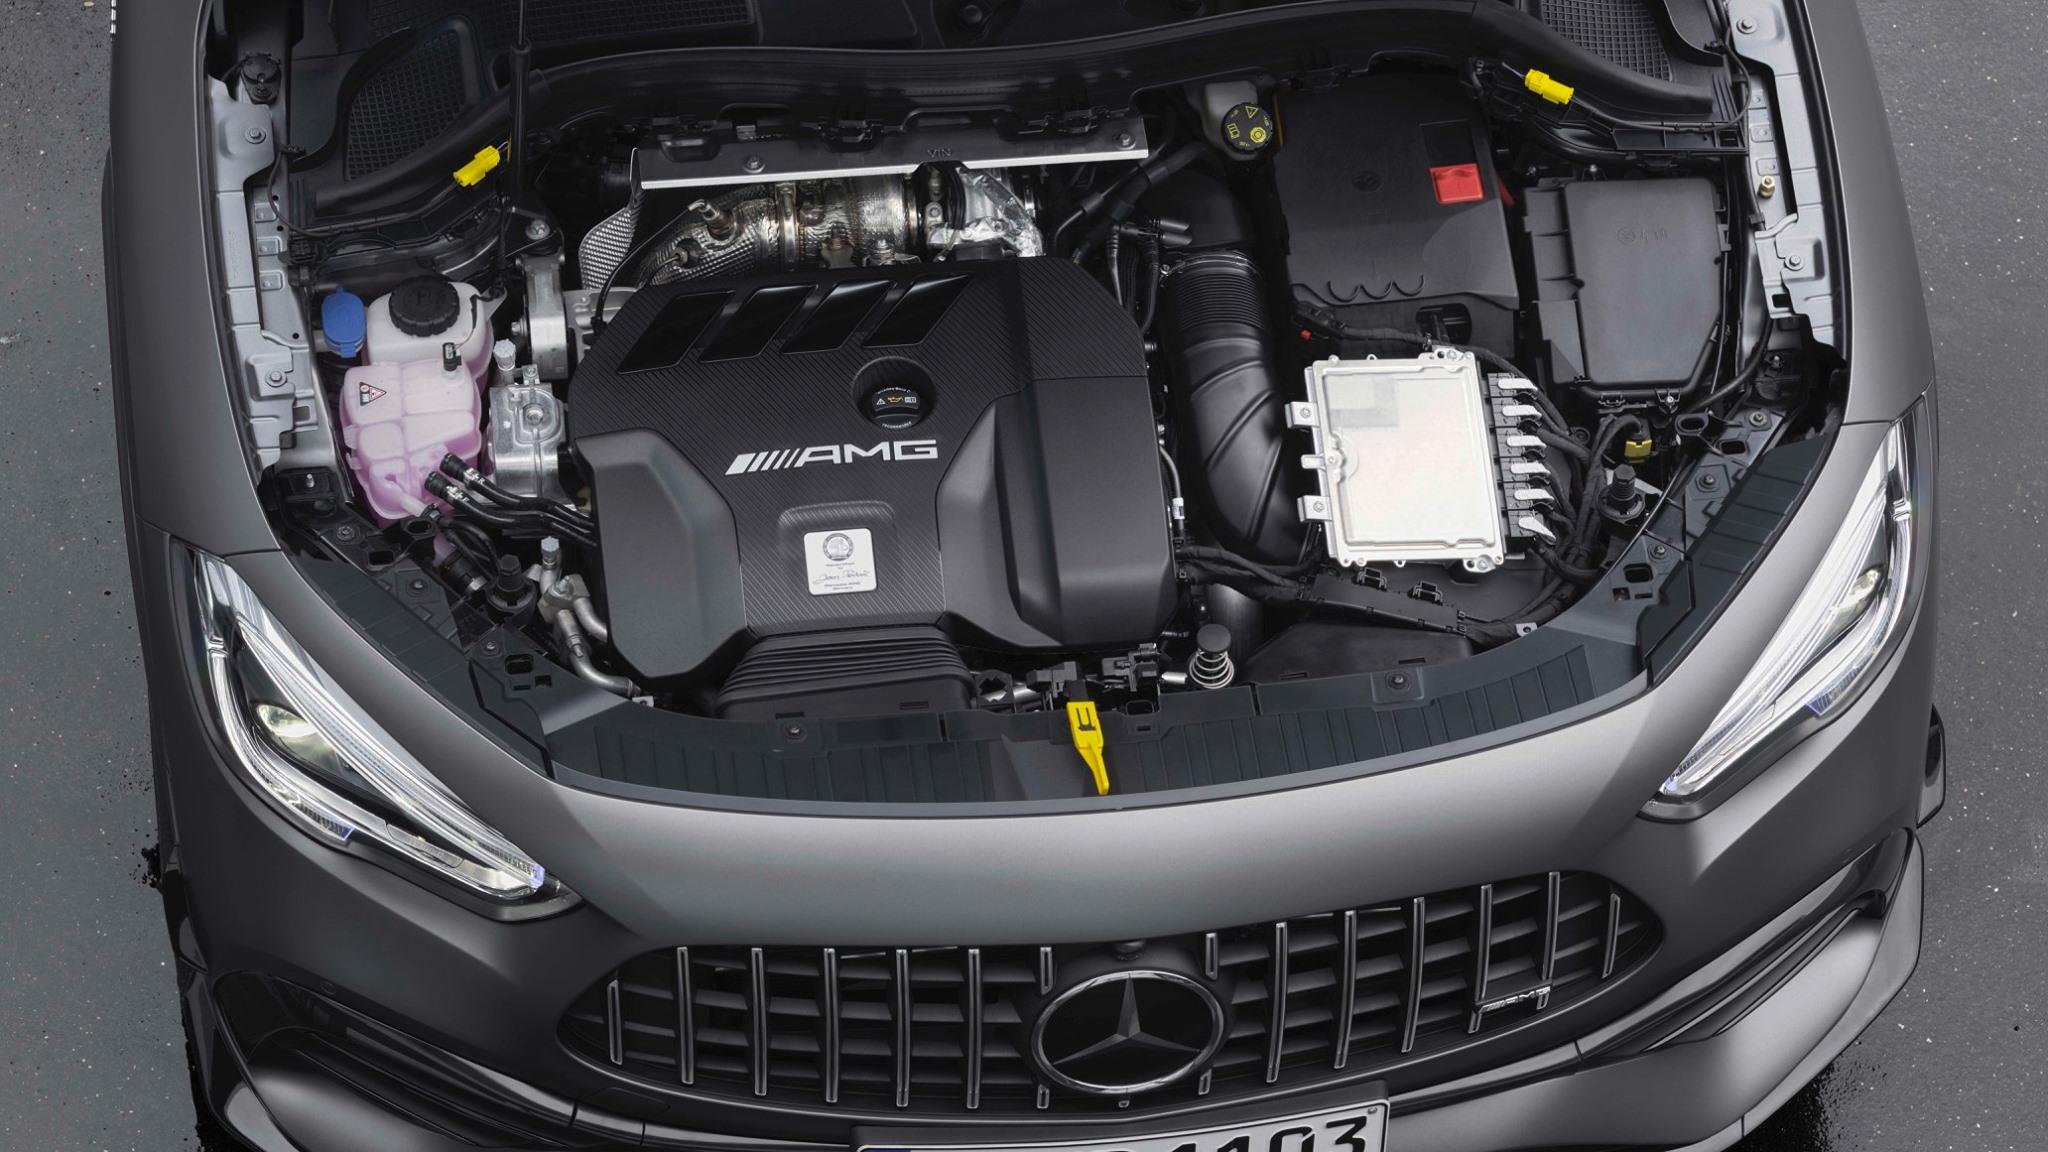 Mercedes-AMG GLA 45 motor